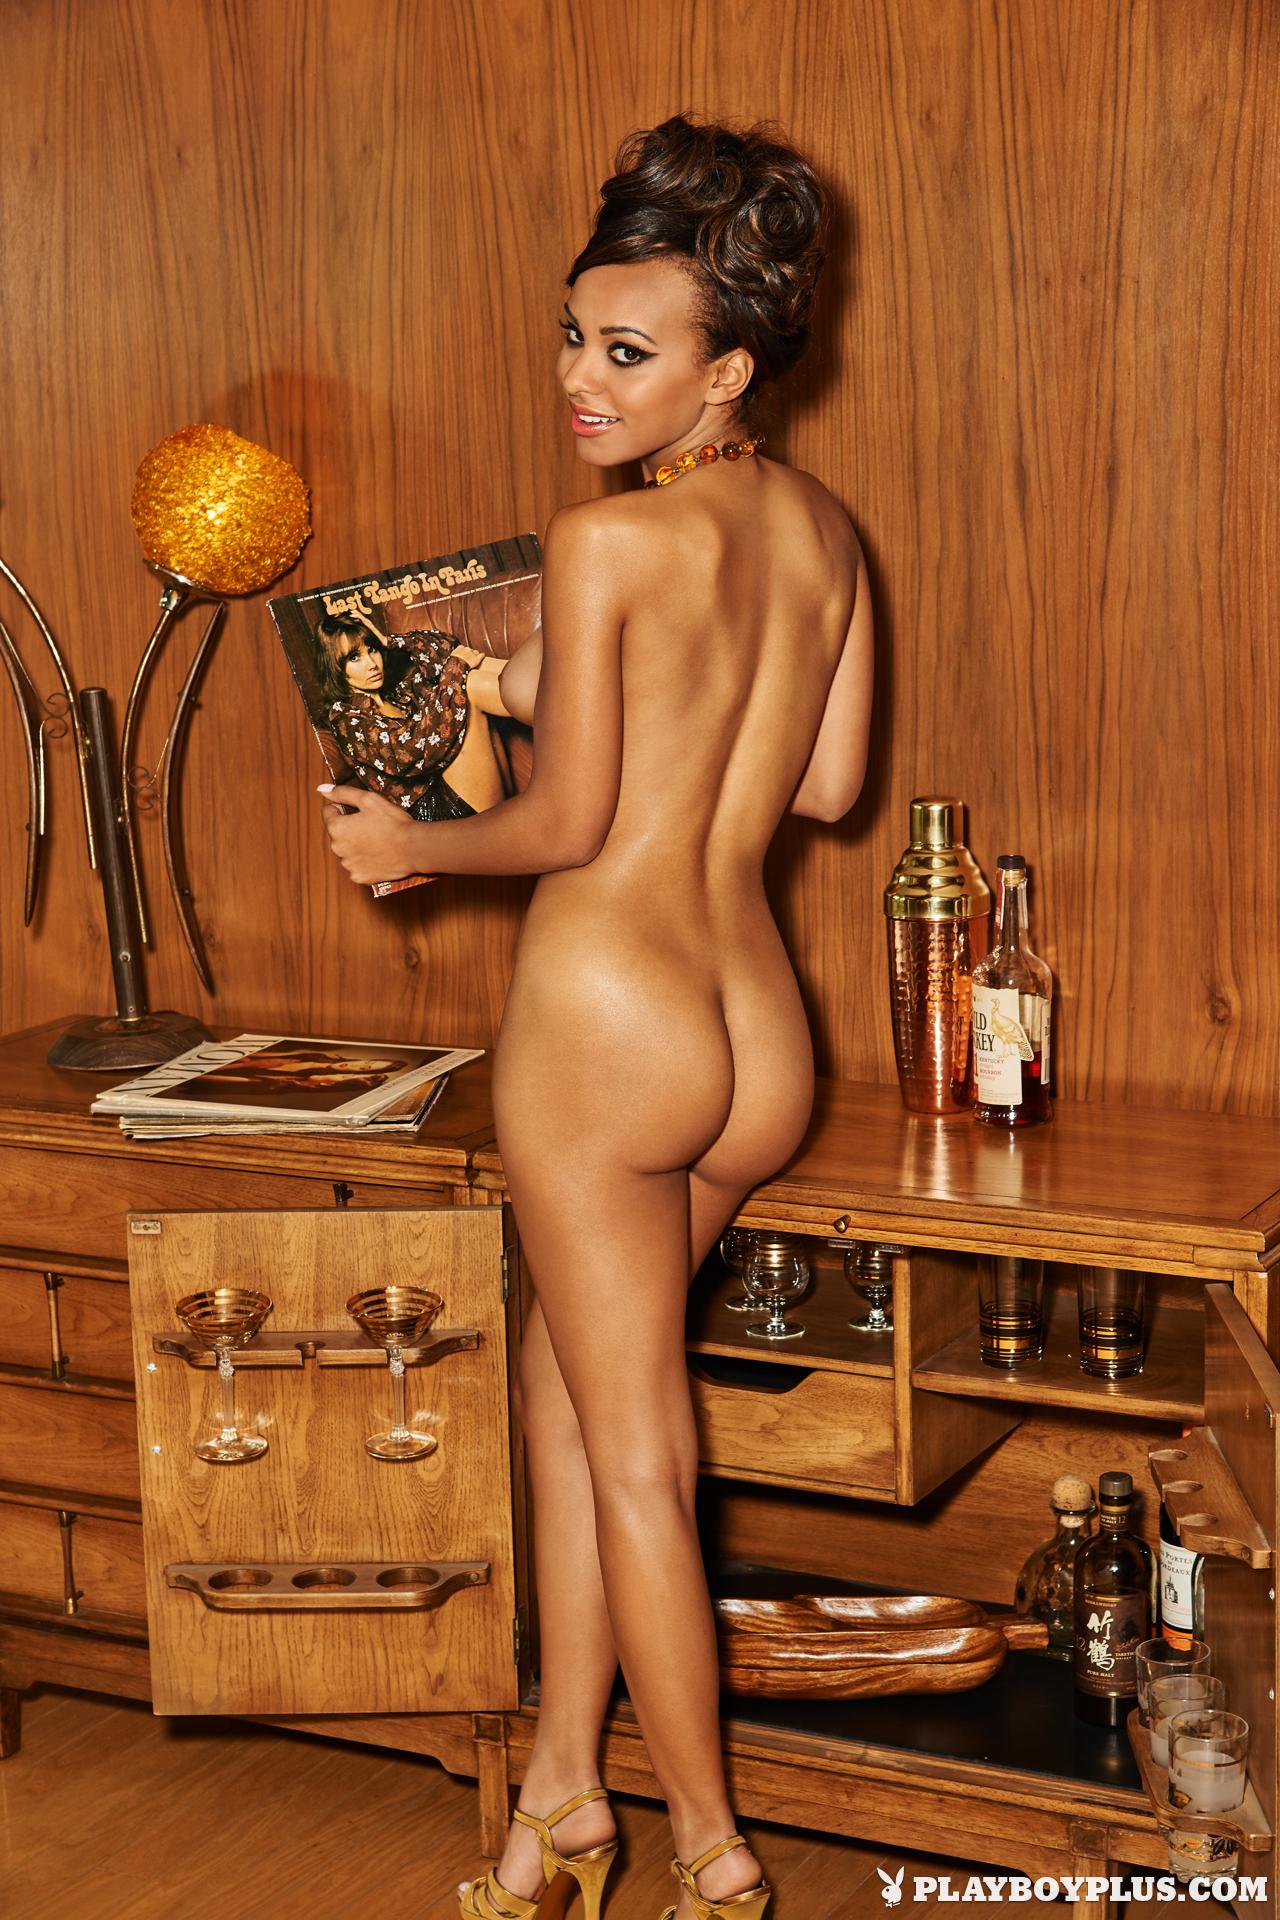 kaylia cassandra nude